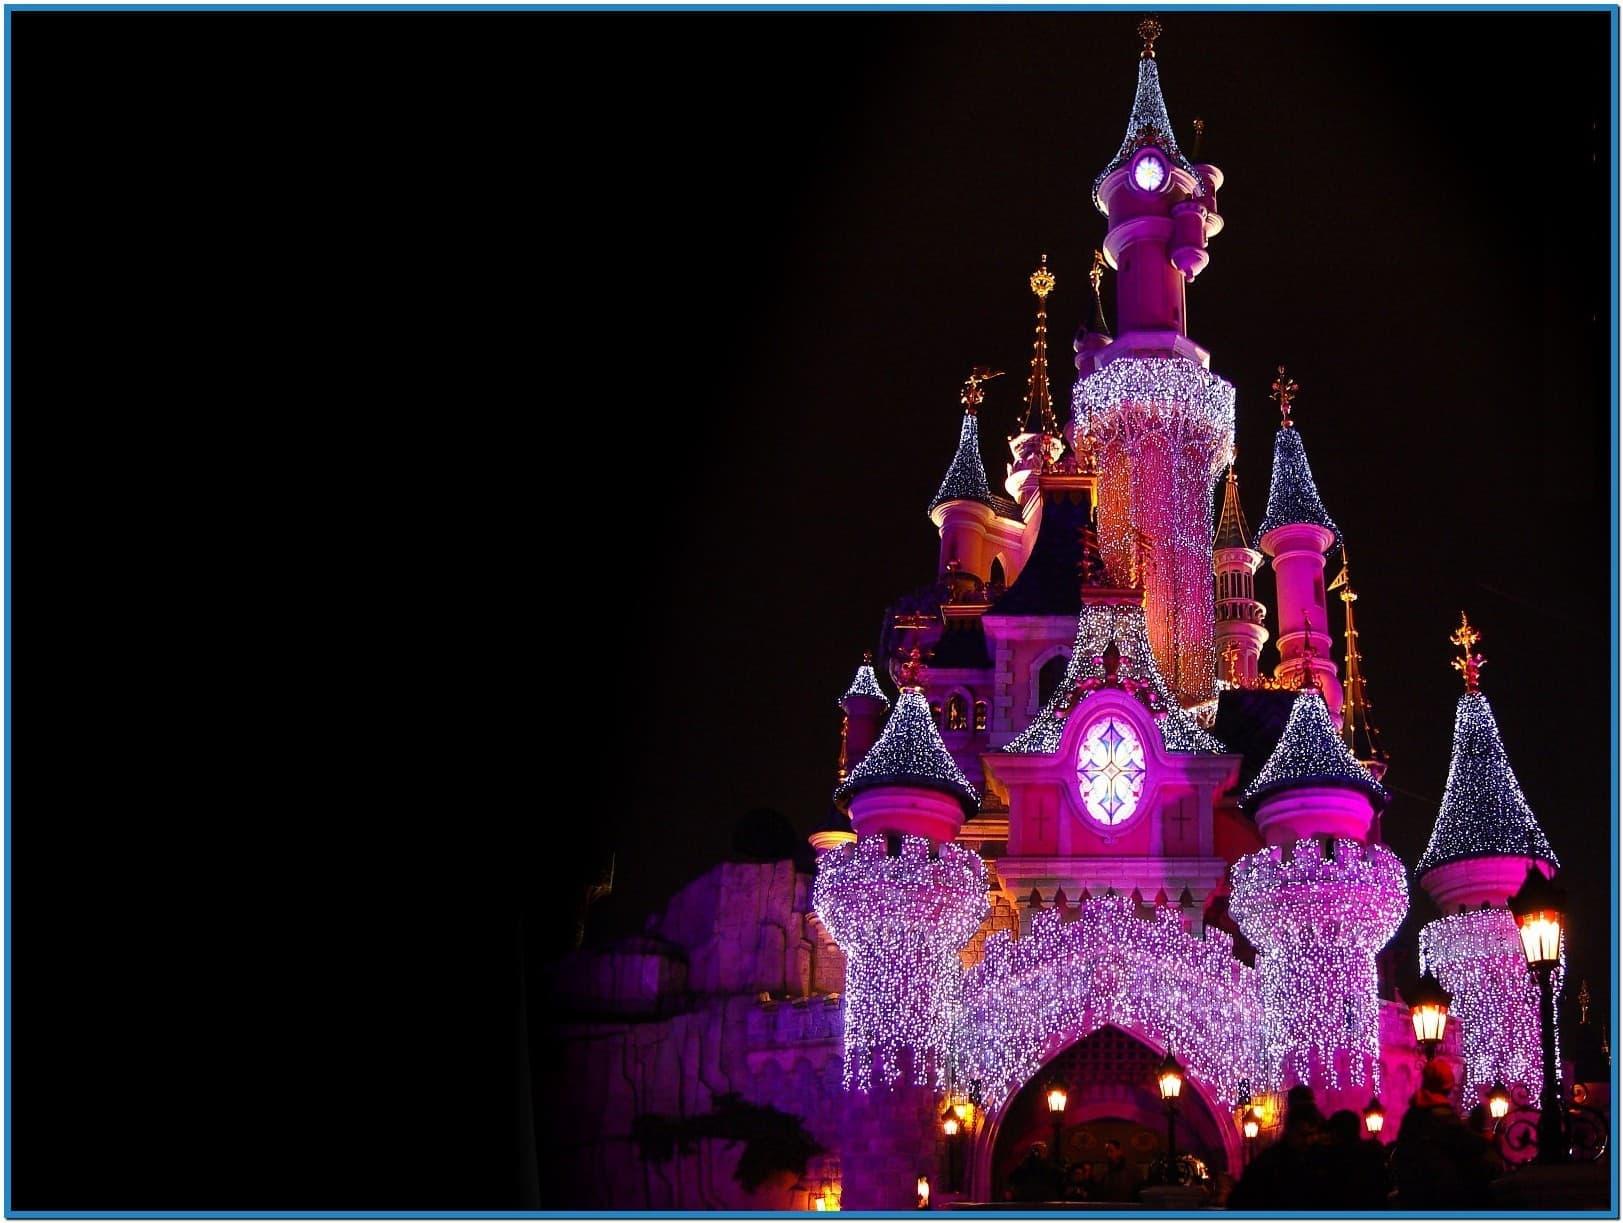 Disney holiday wallpaper screensavers   Download 1623x1223